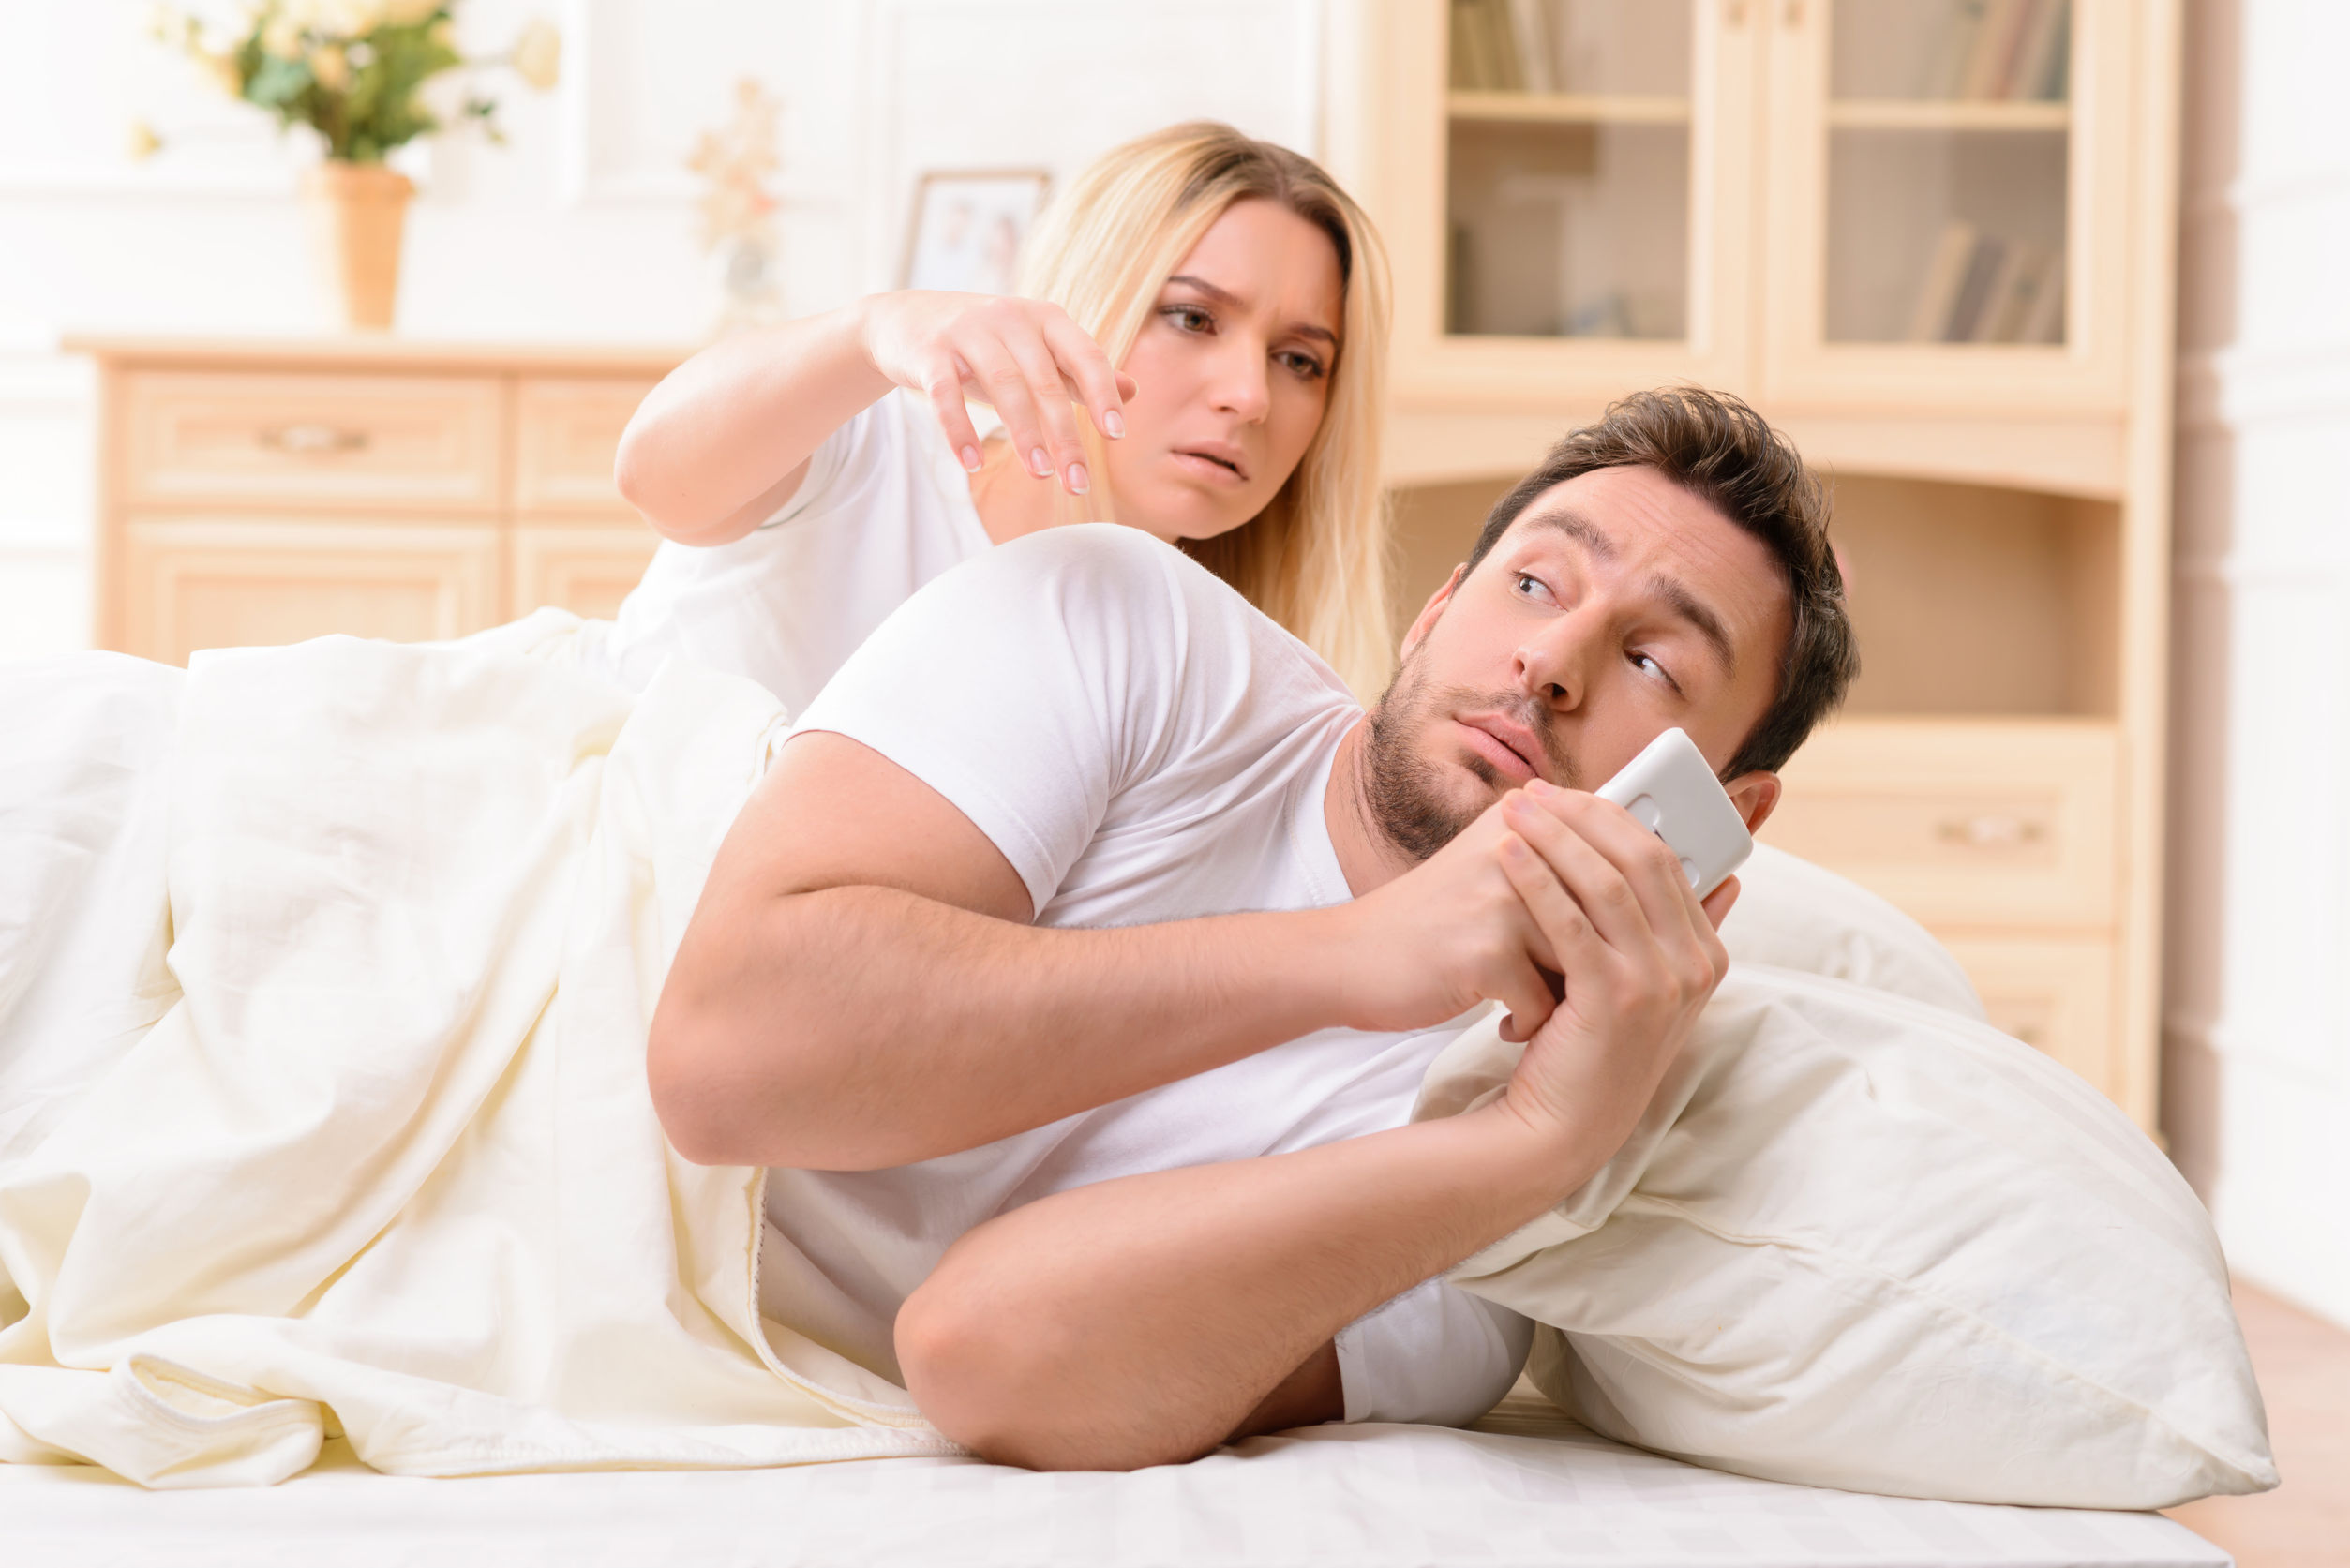 retro-porno-akteri-muzhchini-foto